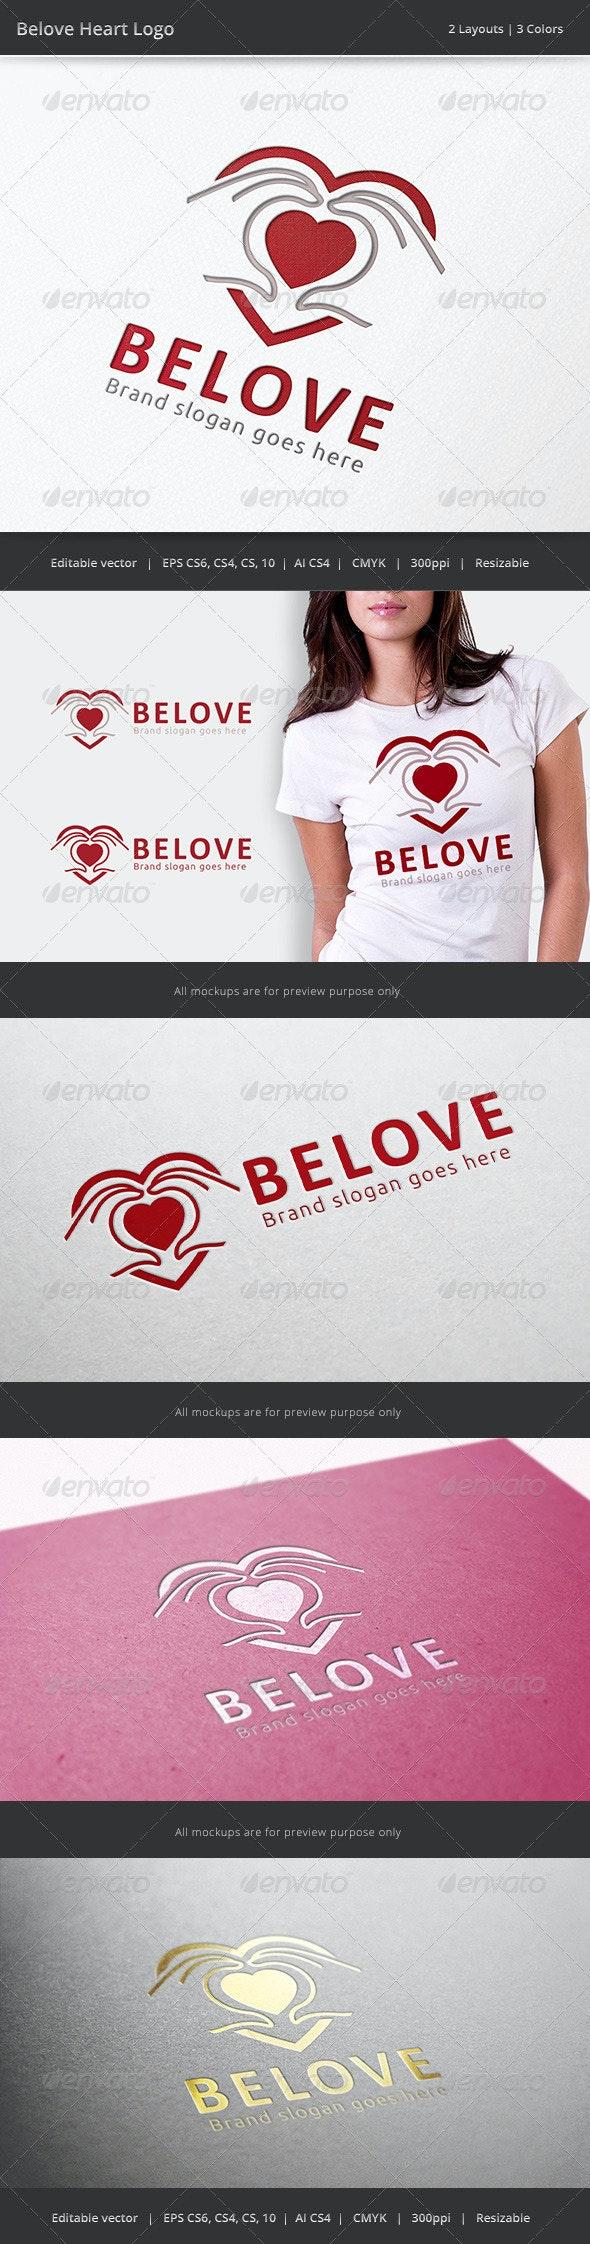 Beloved Heart Hand Logo - Objects Logo Templates